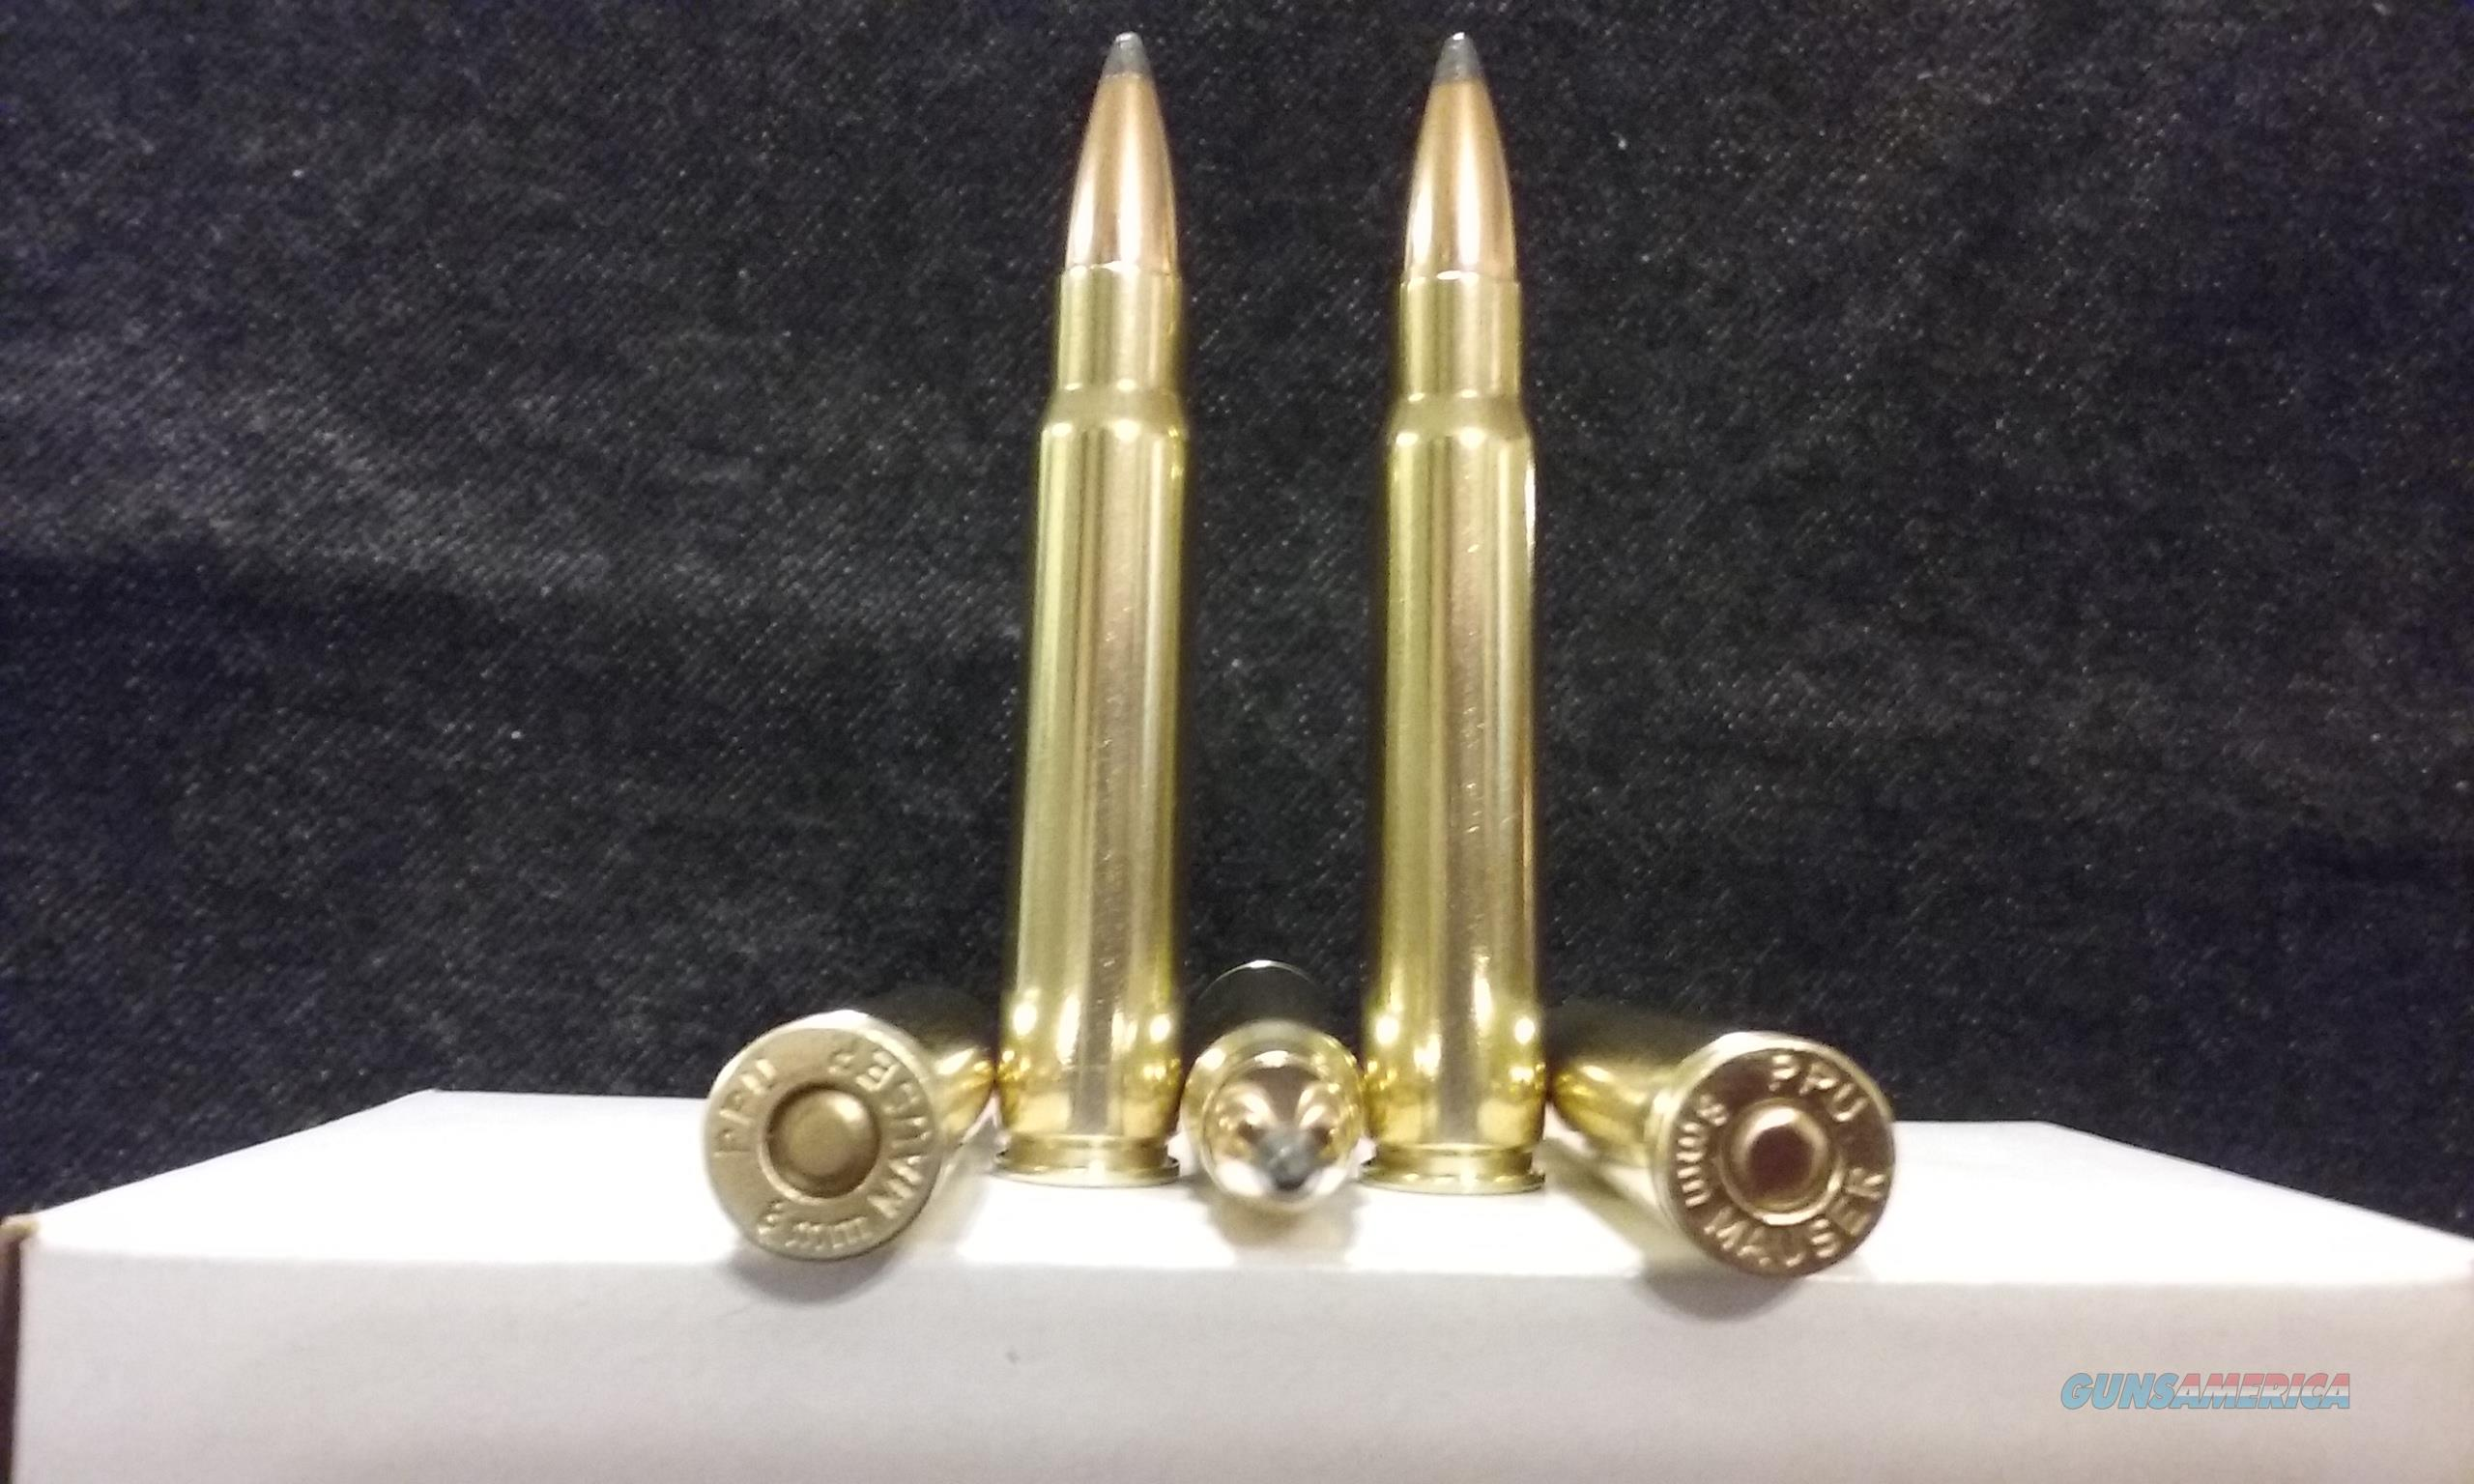 8X57mmJ Mauser Ammo. (7.92X57mmJ - .318)  Non-Guns > Ammunition